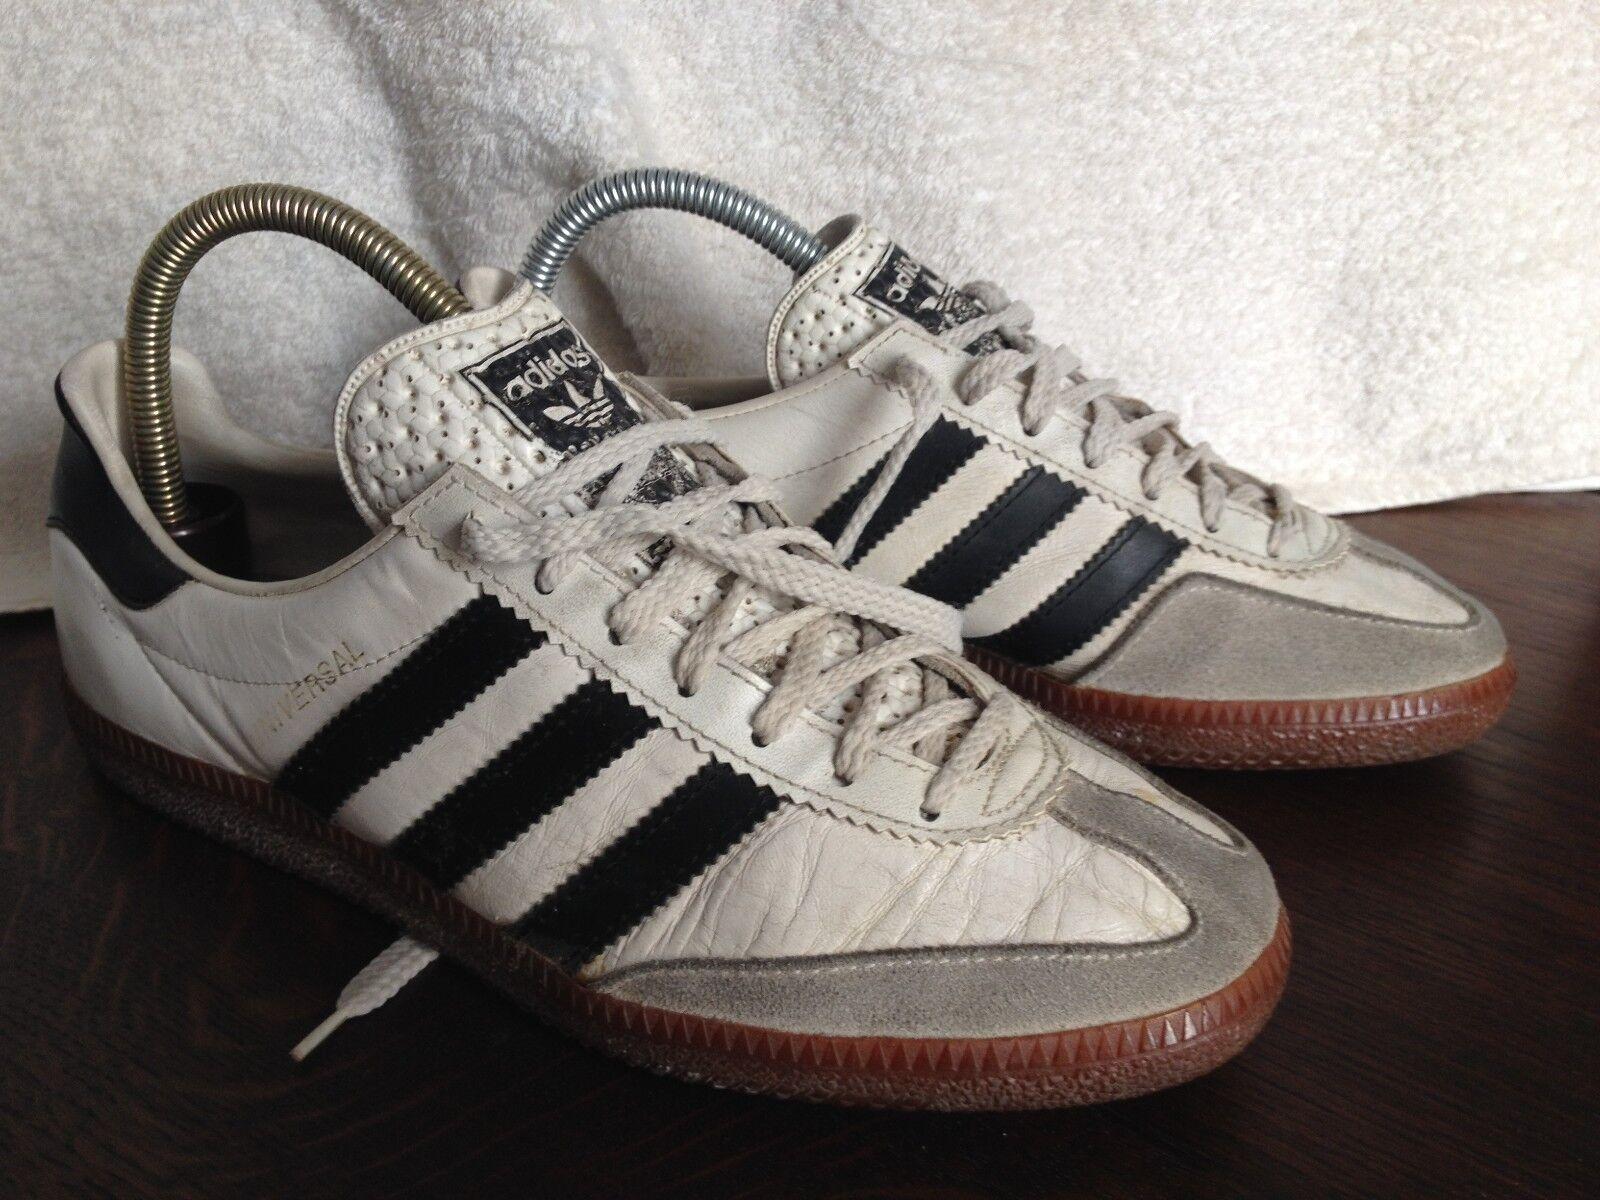 Scarpe da ginnastica Adidas vintage Universal primer modelo años 70 EU 39 - US 7